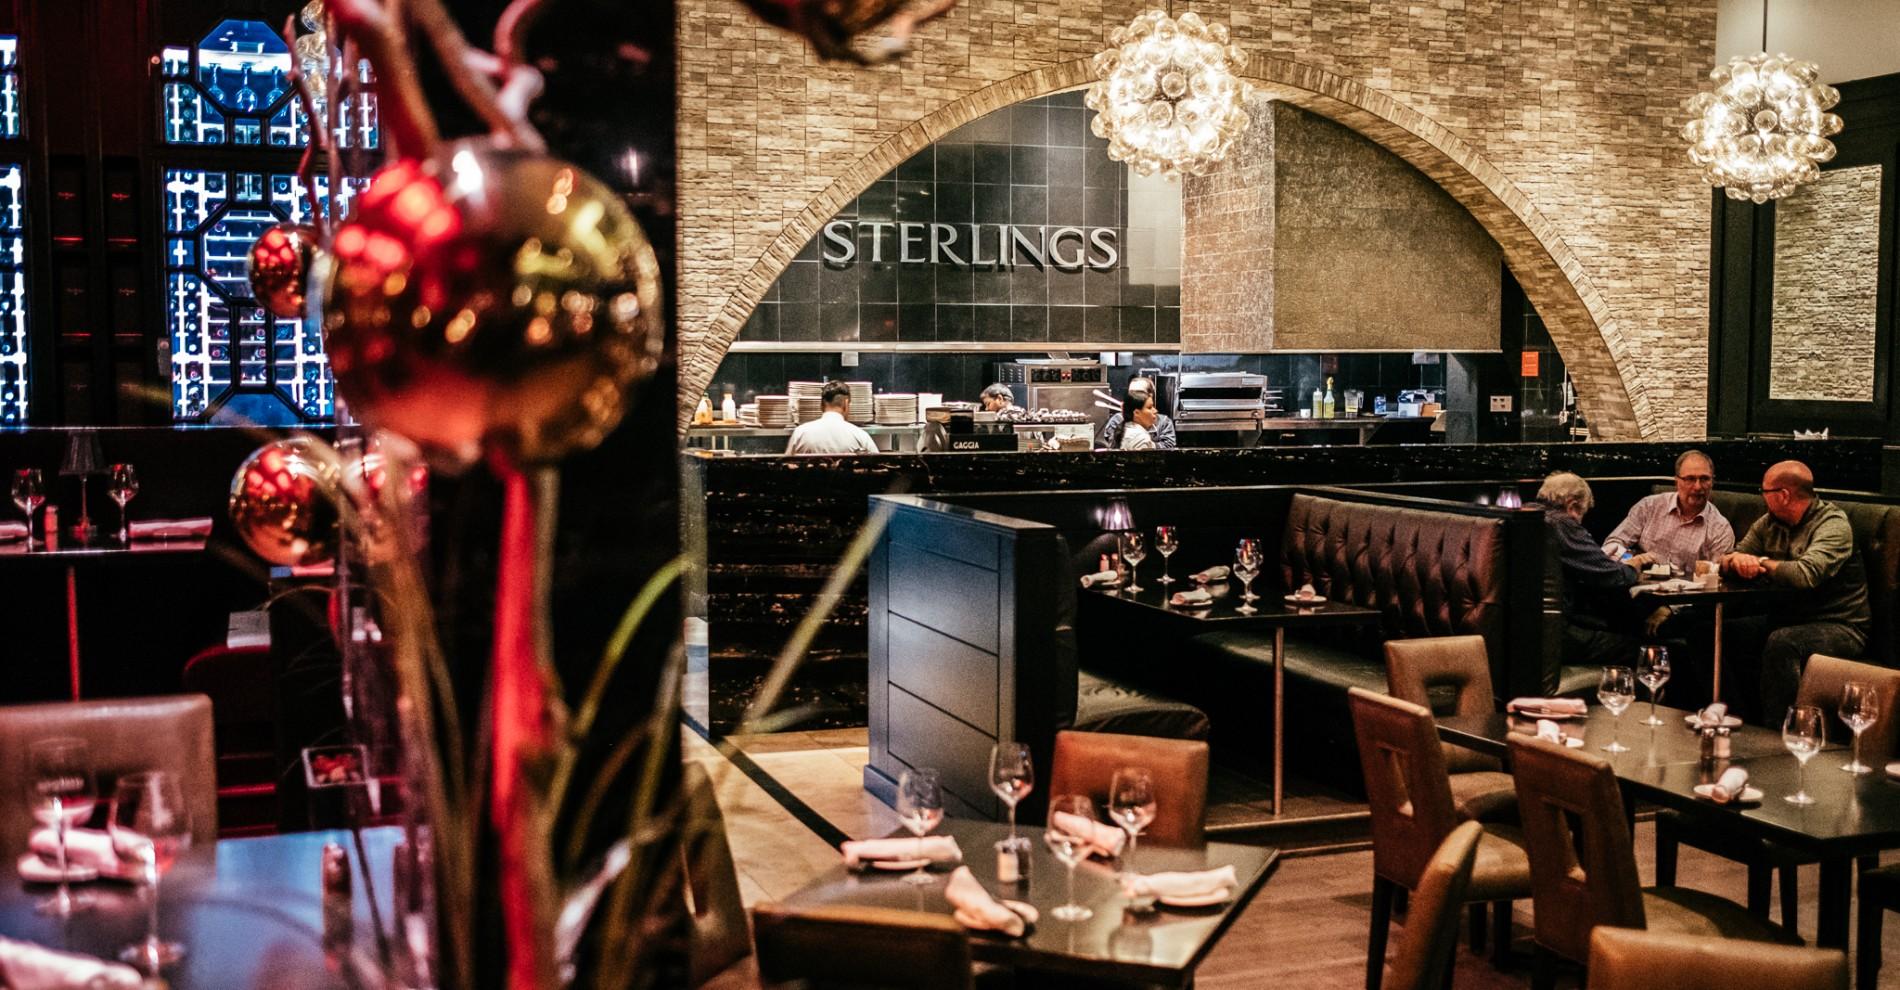 Details Sterlings Steakhouse 2018 125 Fr